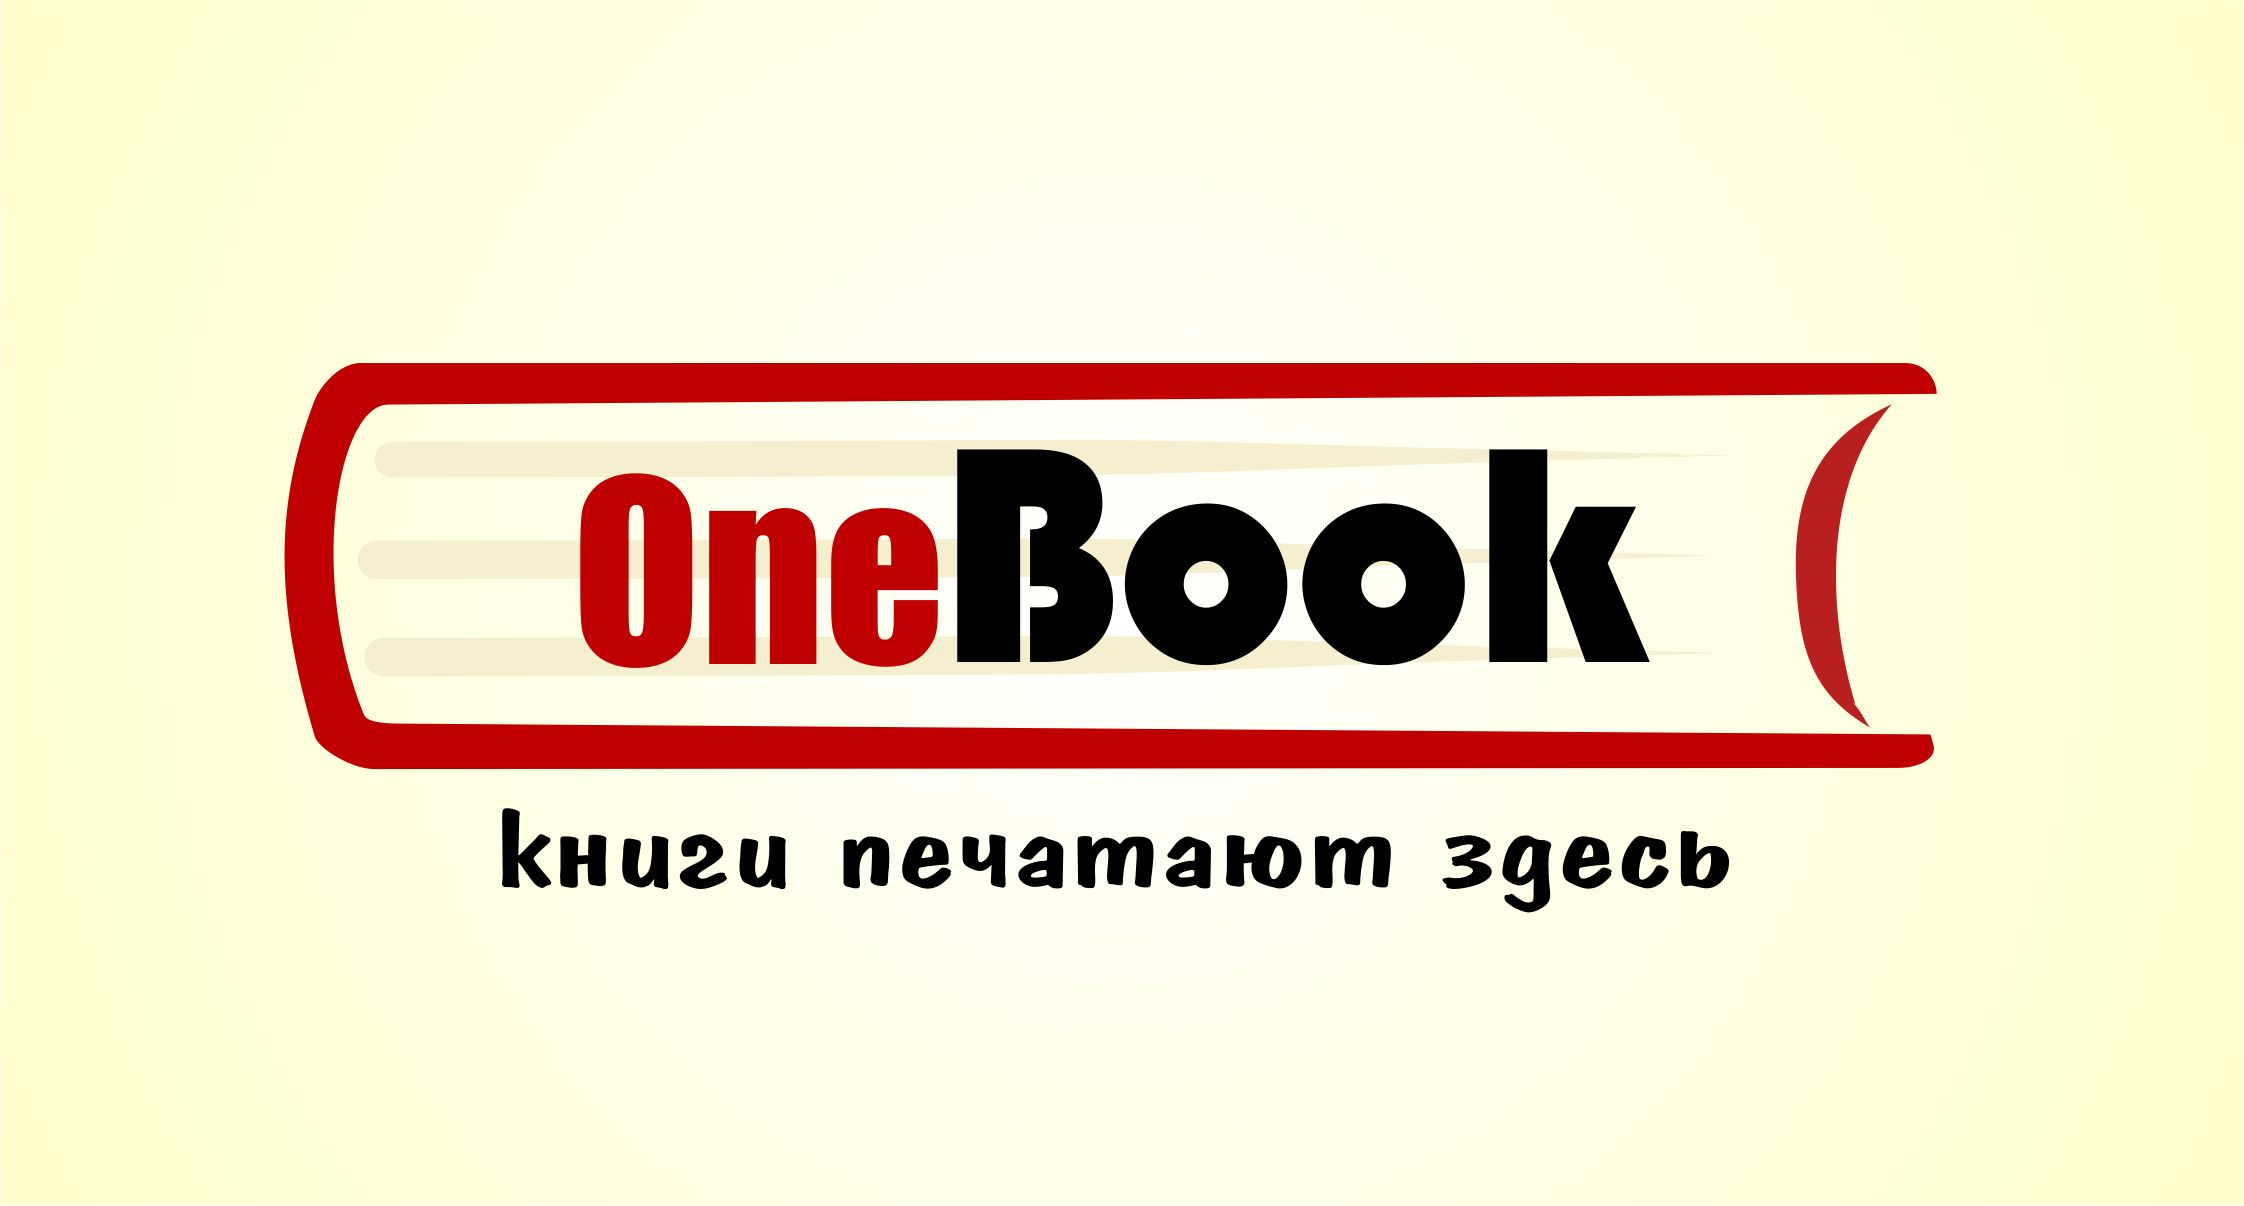 Логотип для цифровой книжной типографии. фото f_4cc05e860b5f0.jpg